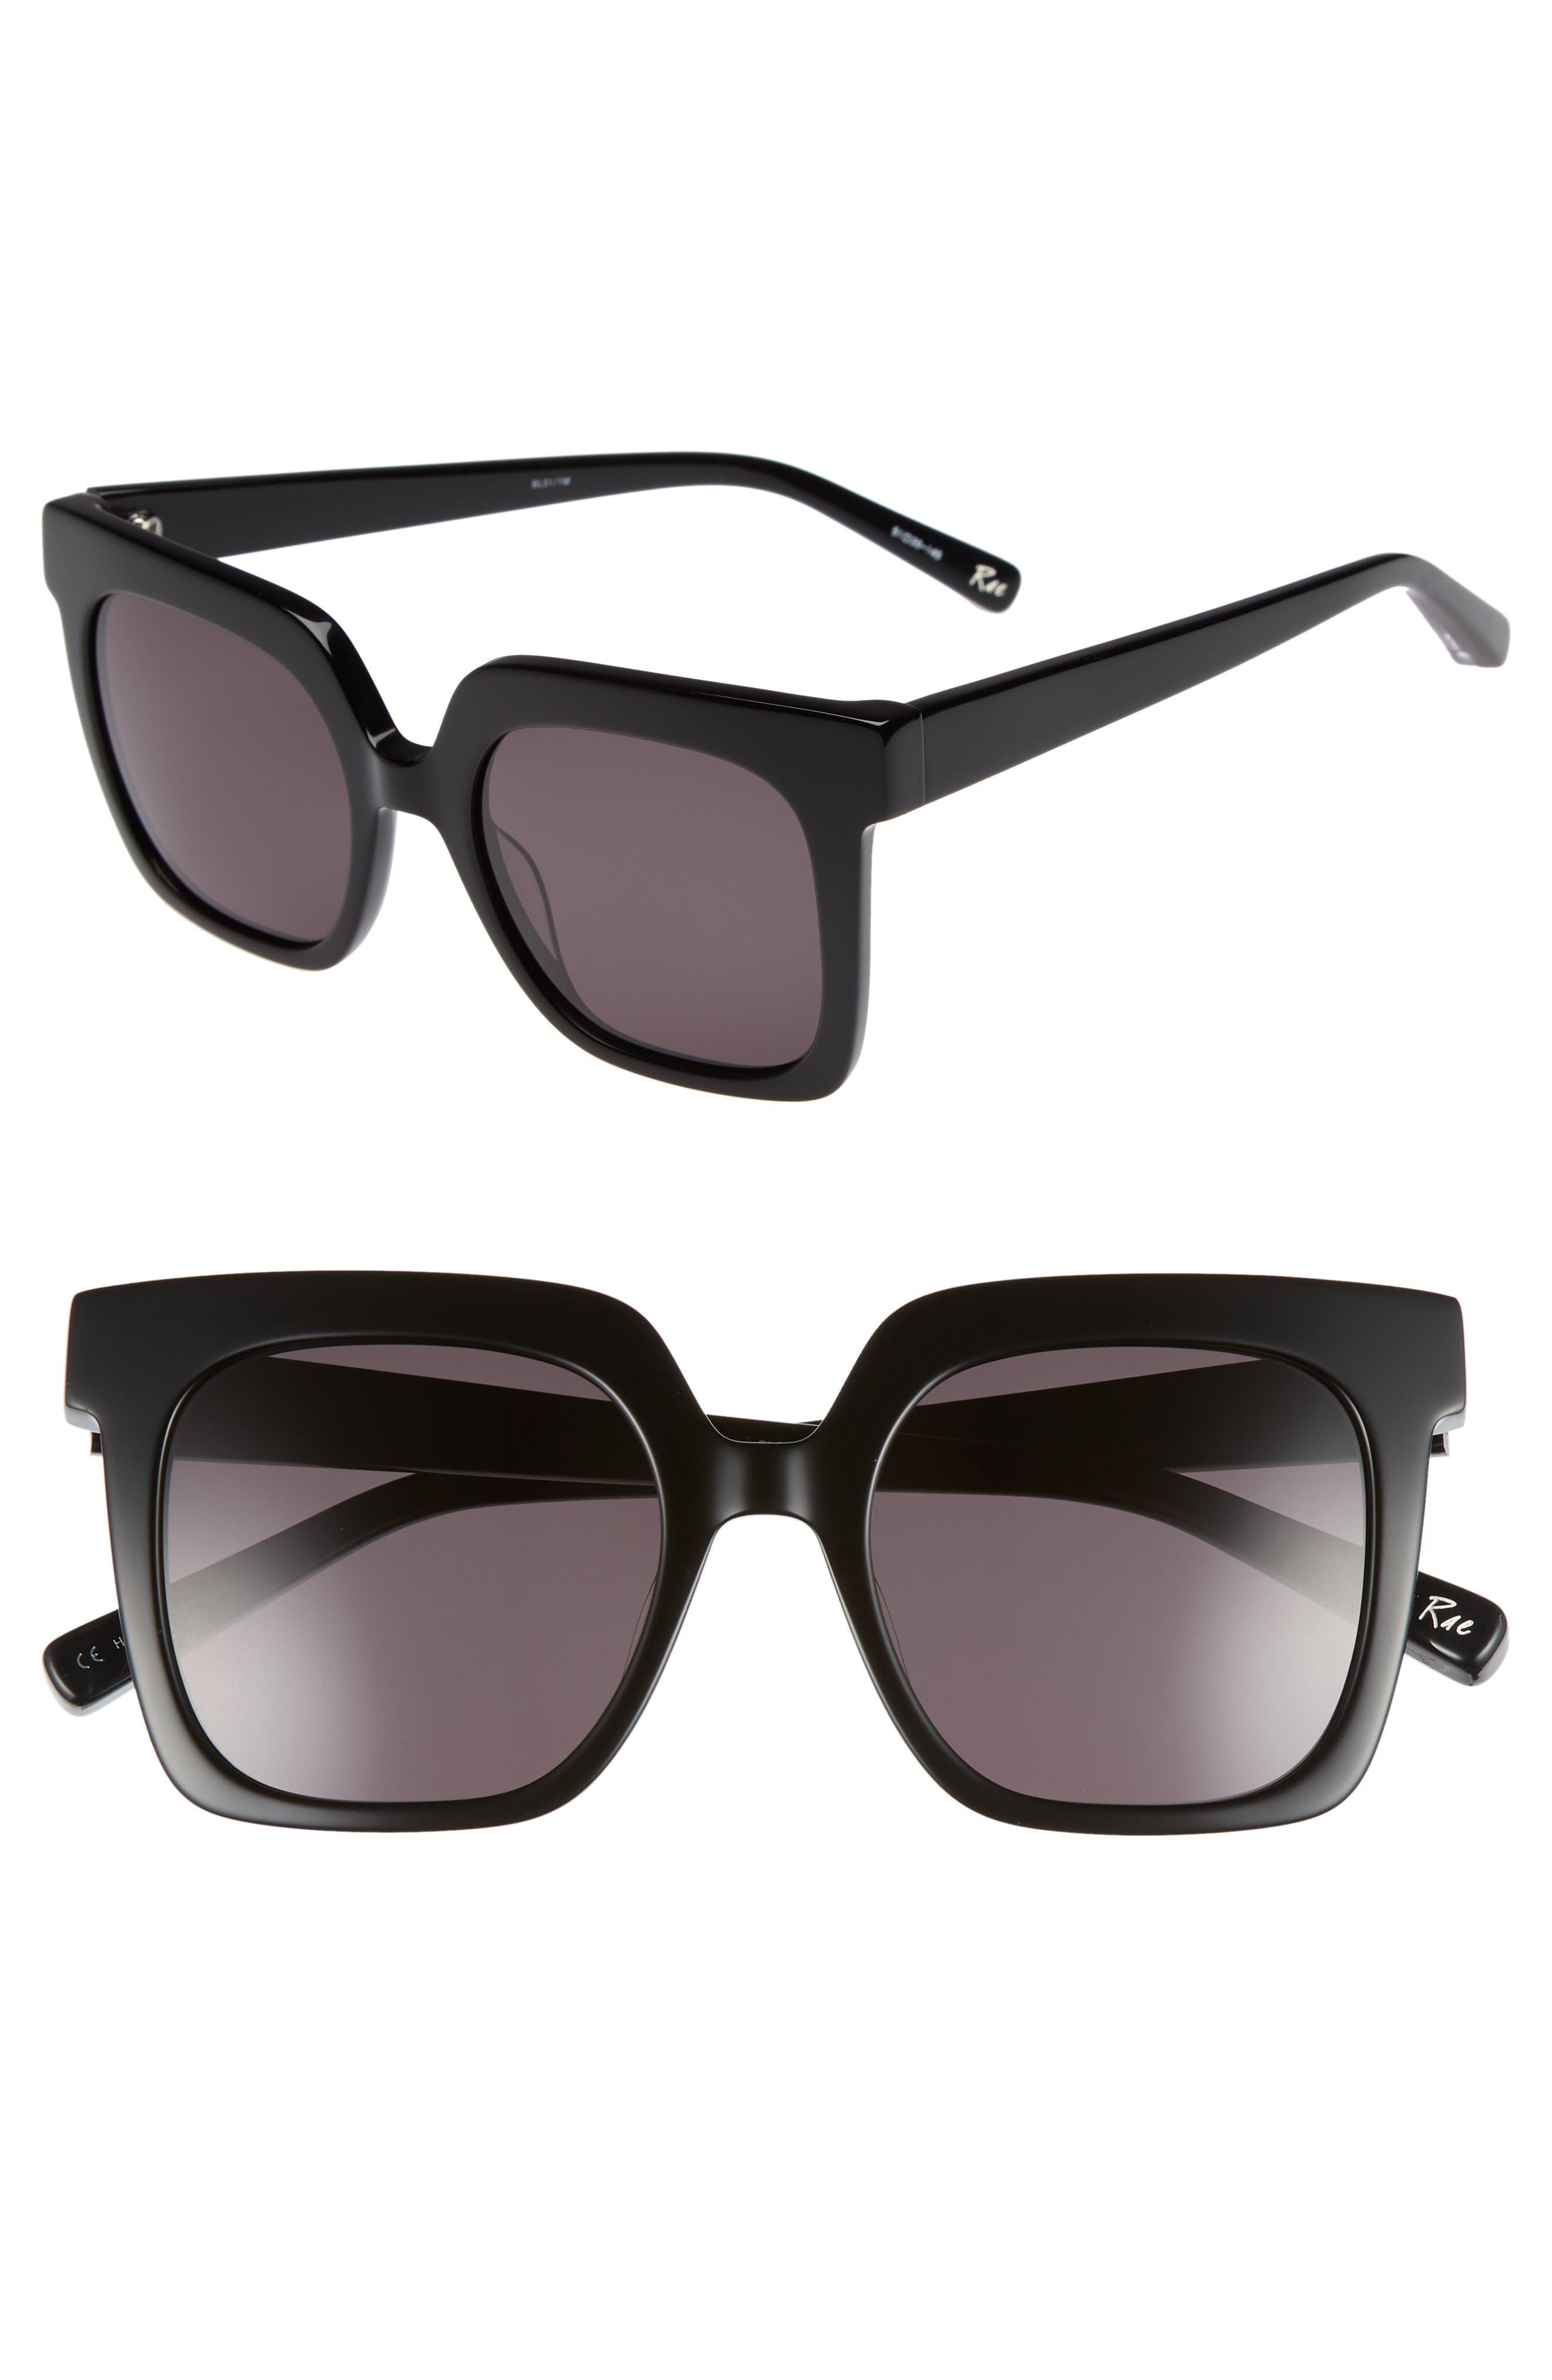 Rae 51mm Square Sunglasses,                         Main,                         color, 001